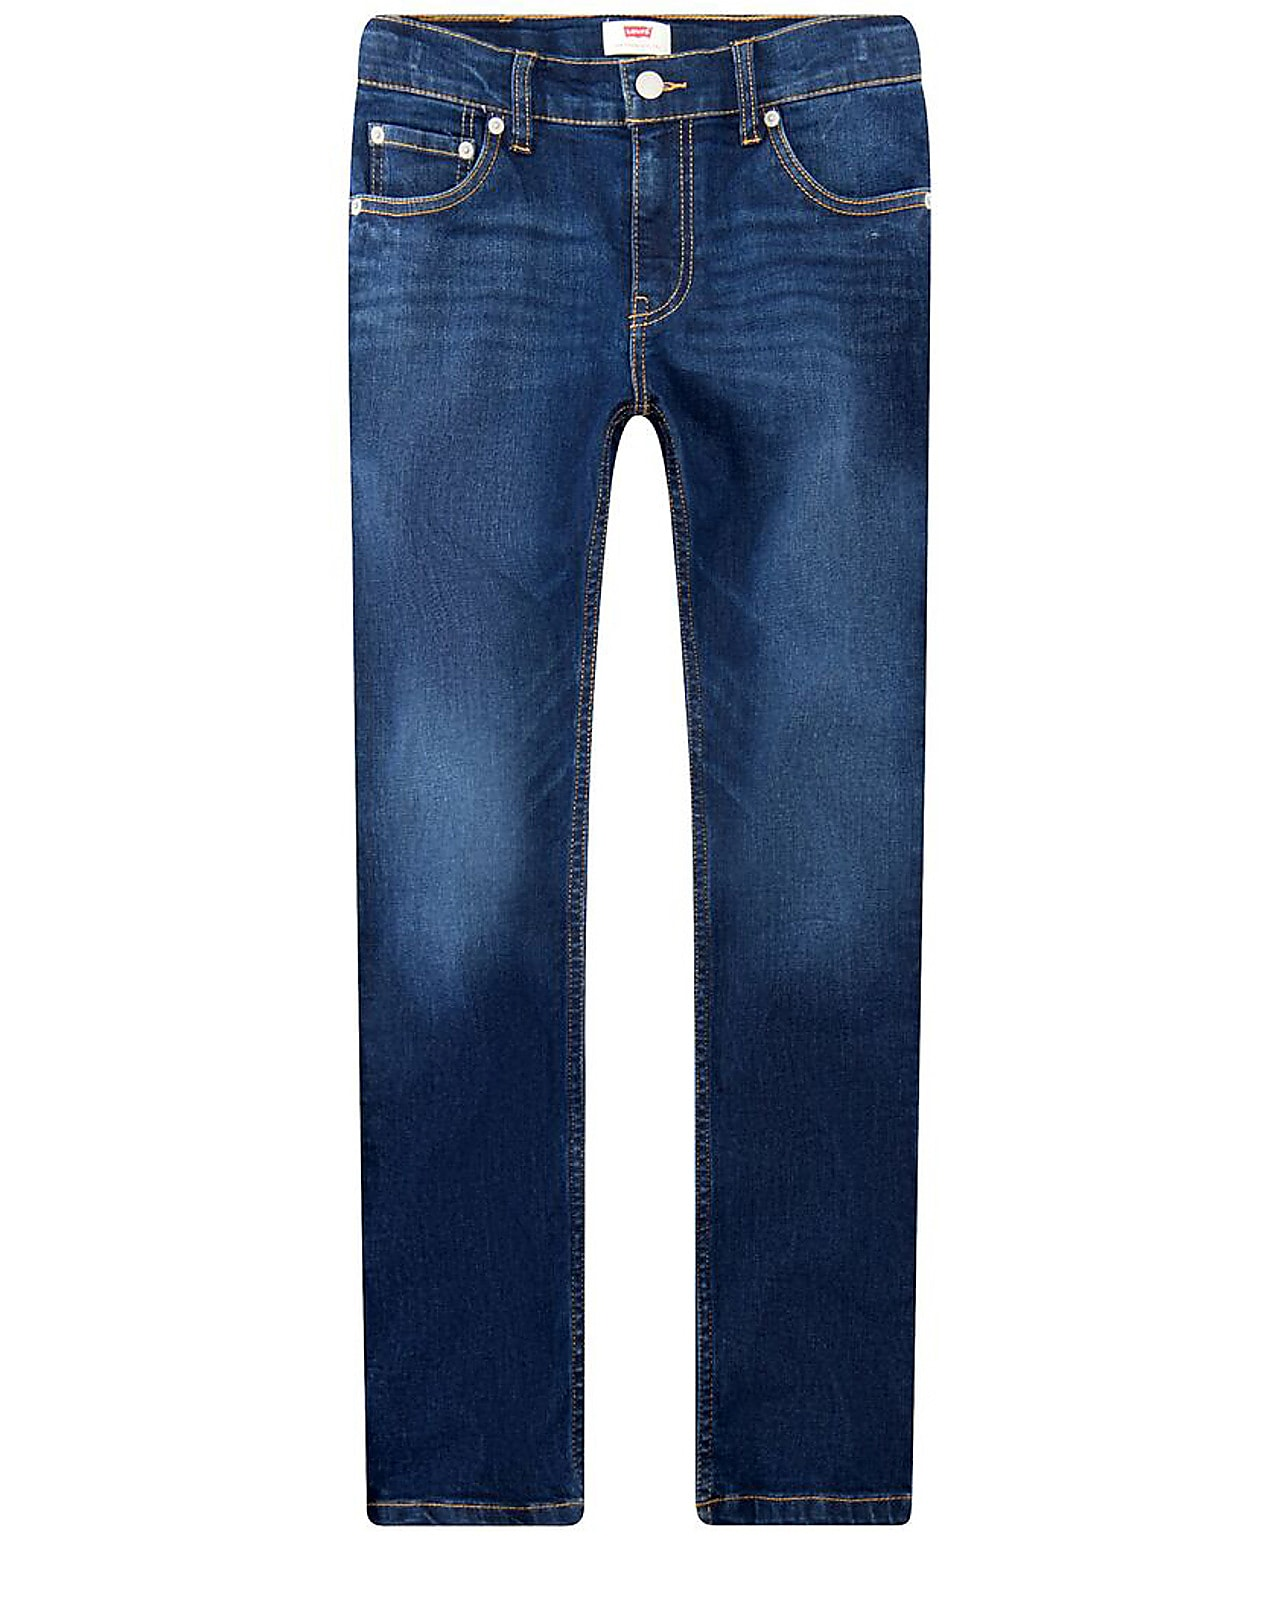 Image of Levis 510 jeans, Jean, machupicchu